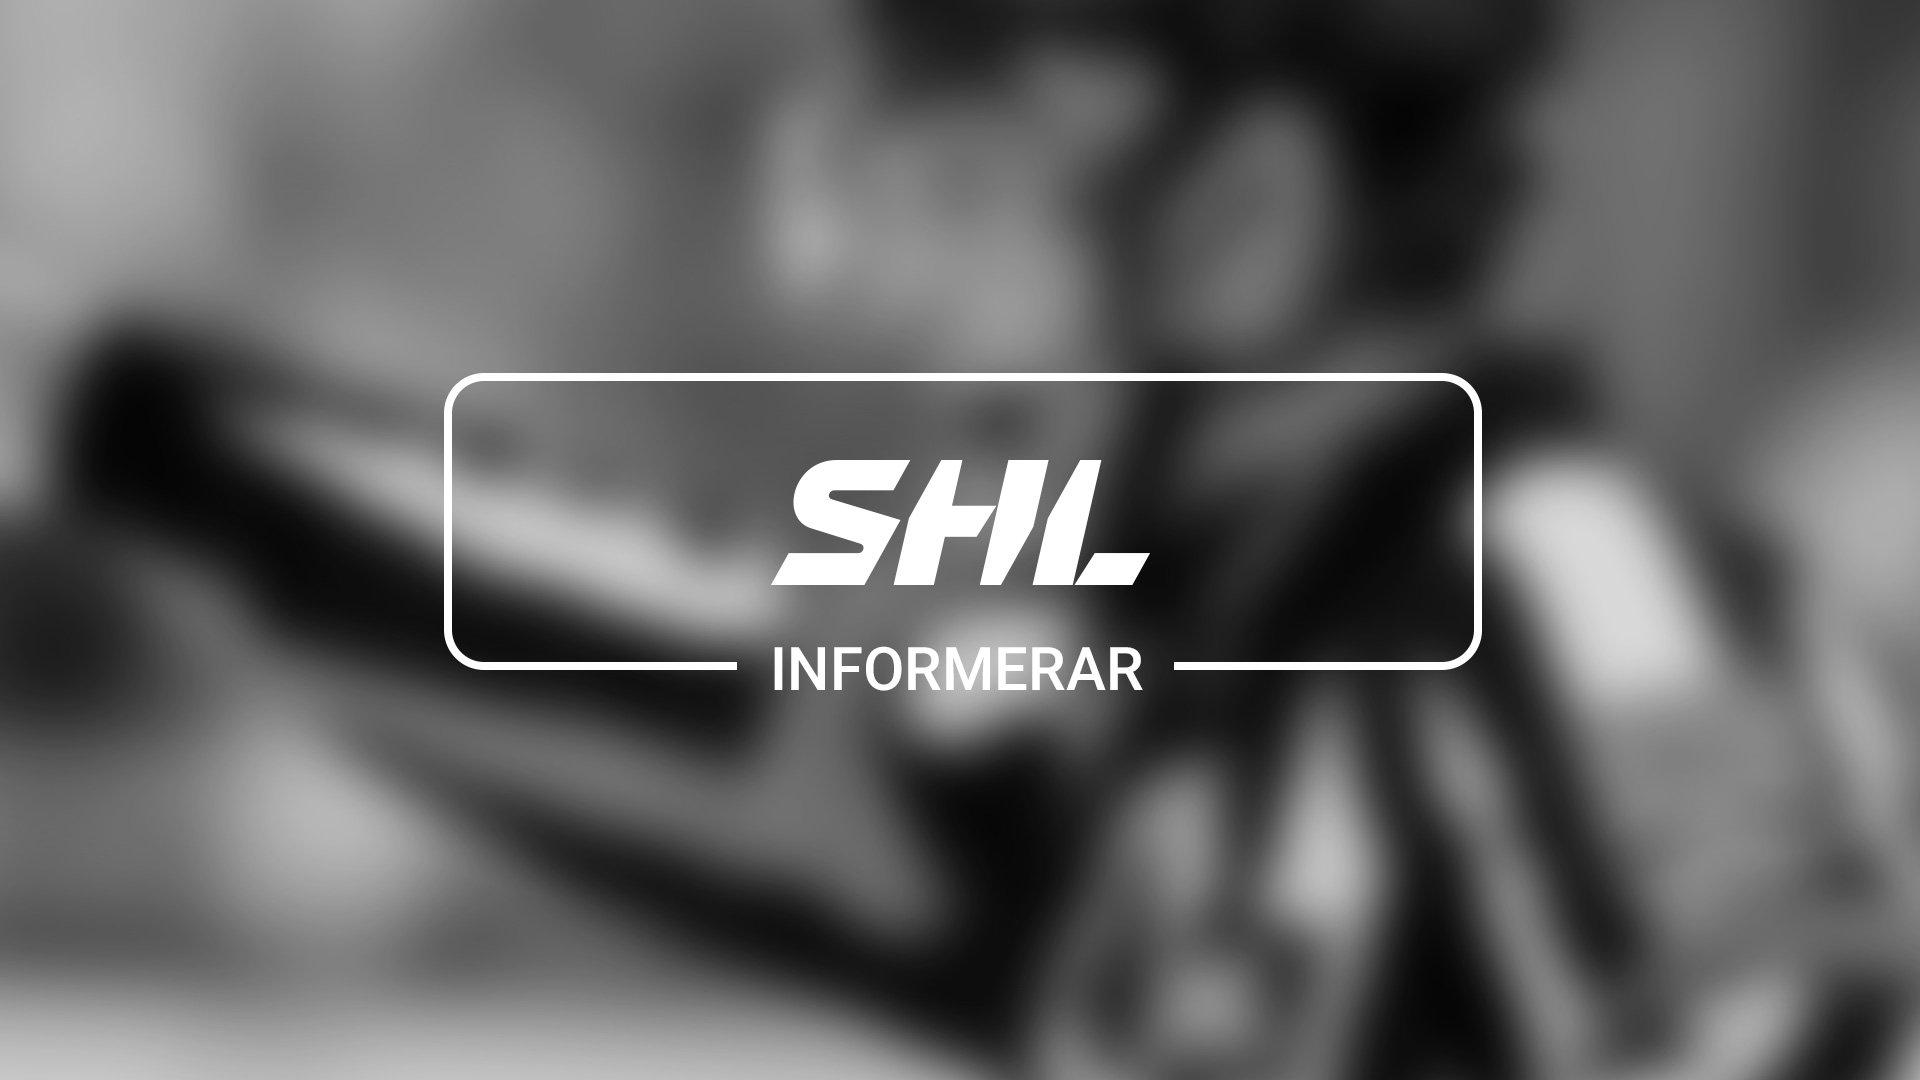 2018-01-25 LHF-SKE, Jonathan Pudas, godkänt mål